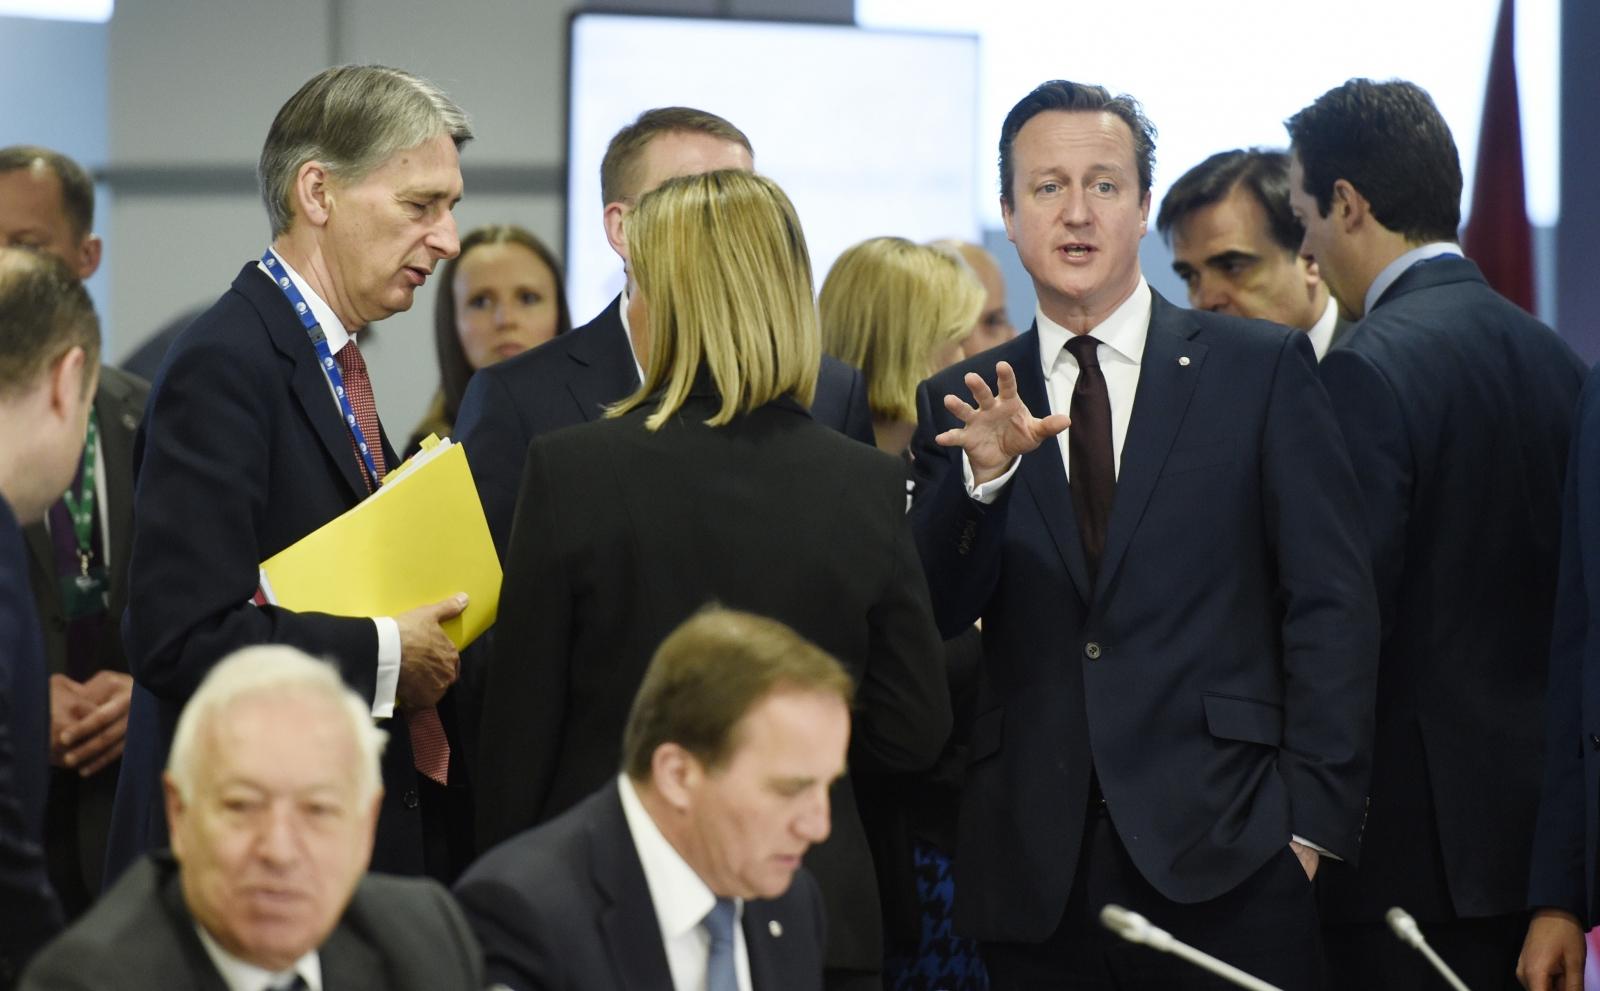 David Cameron and Philip Hammond